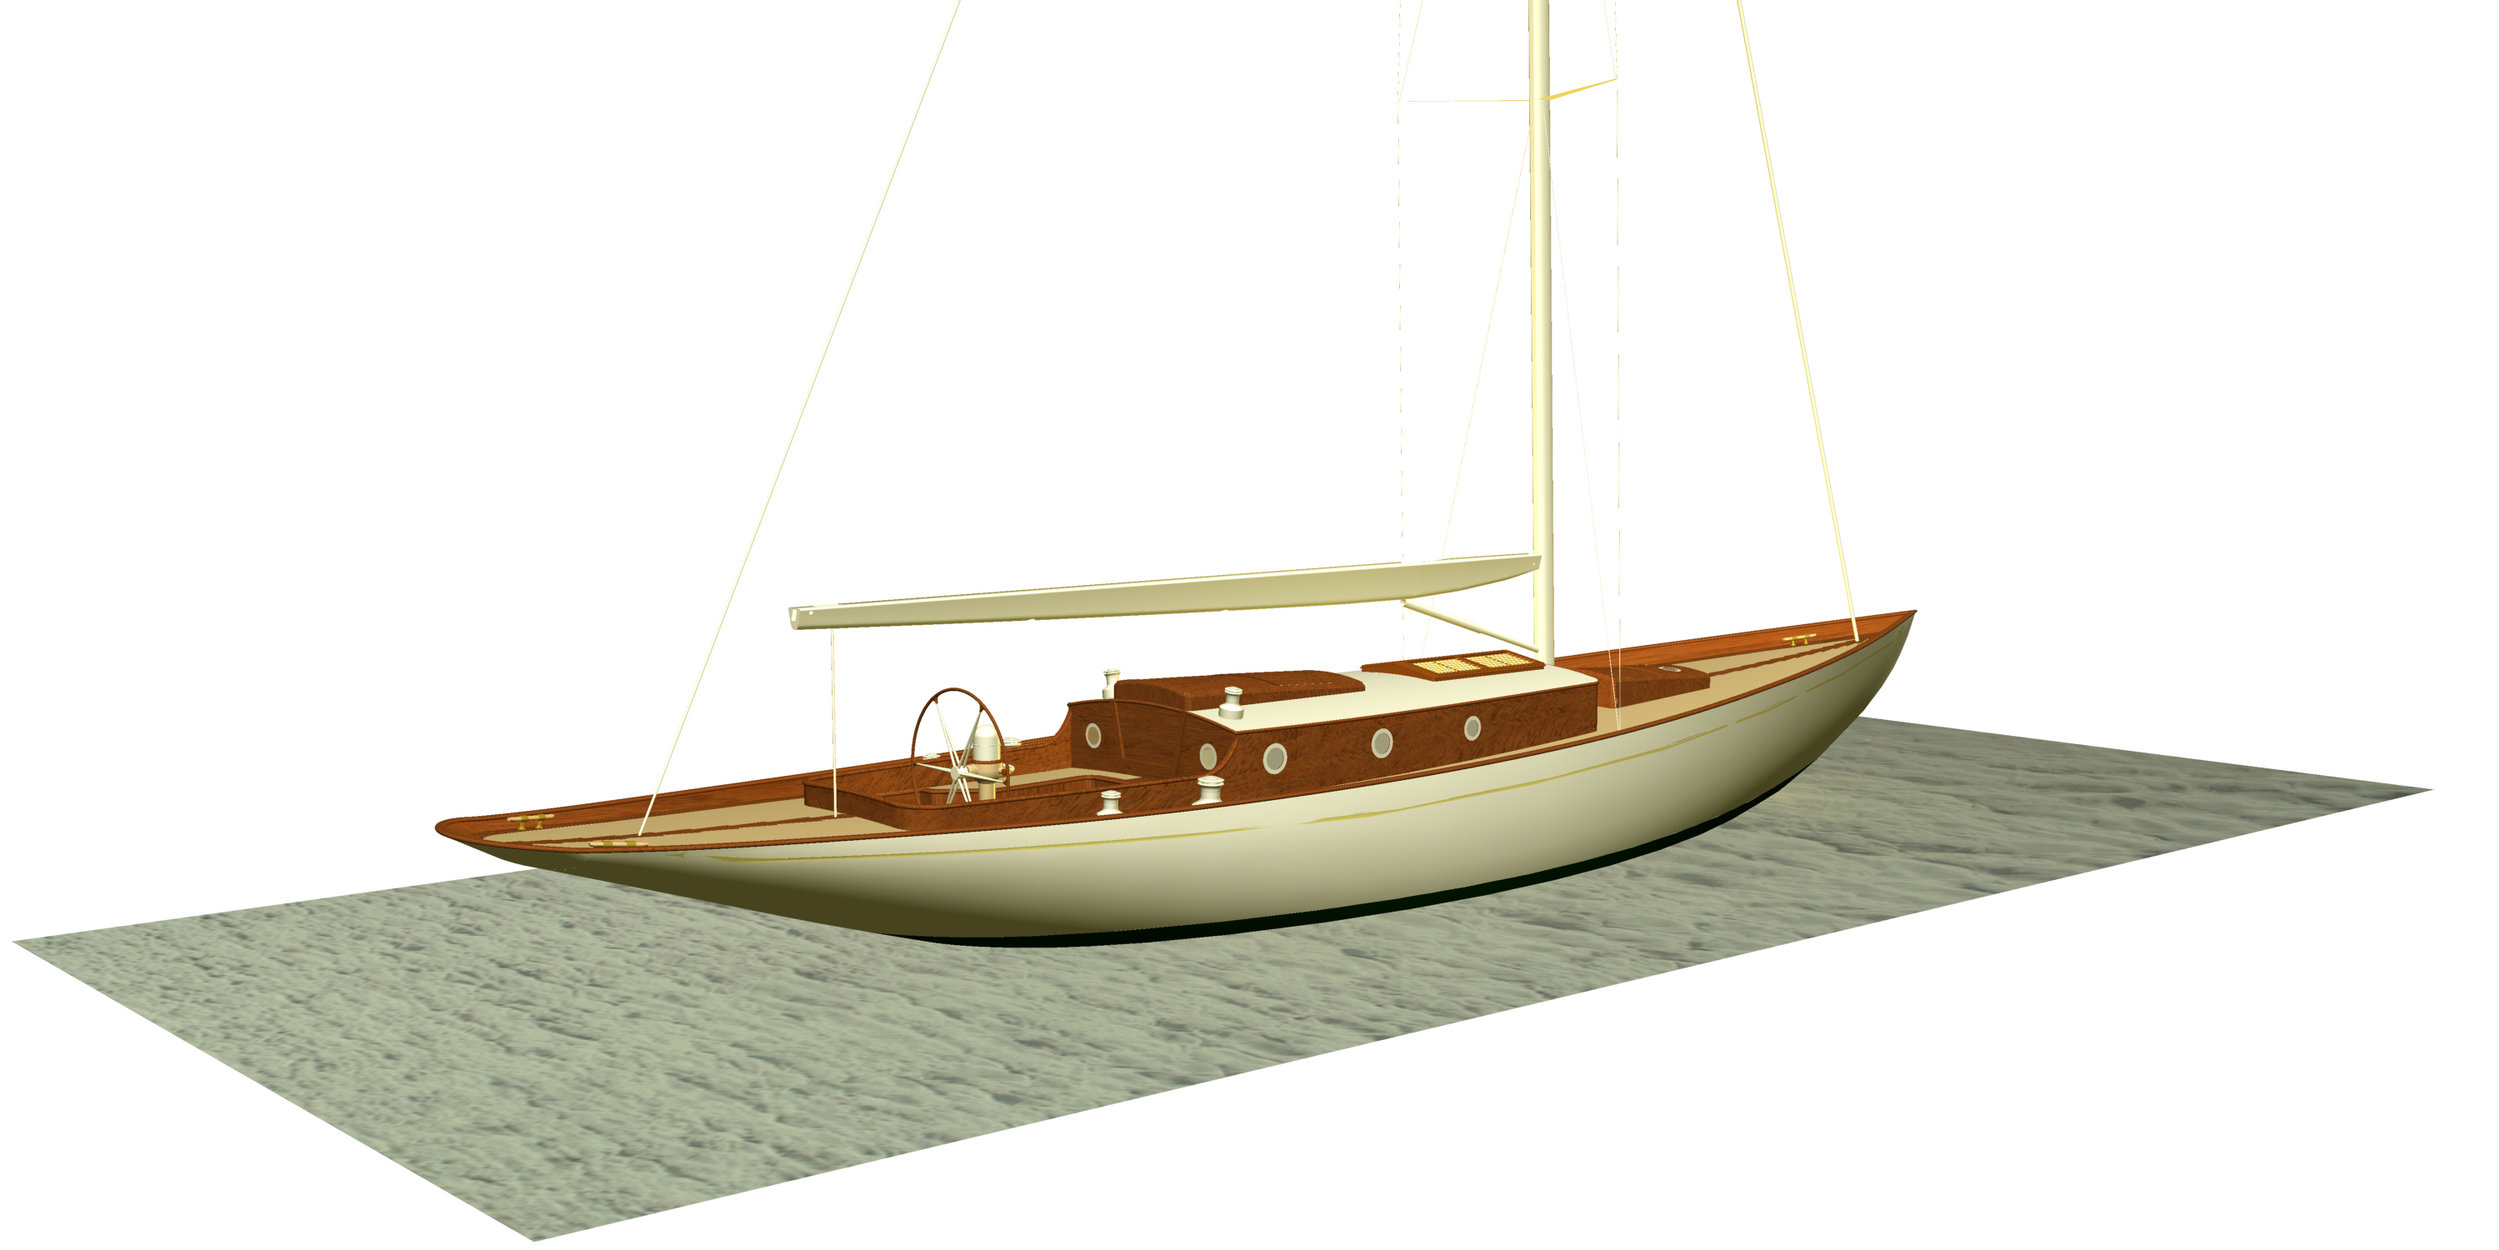 Fairlie 45 modern classic yacht